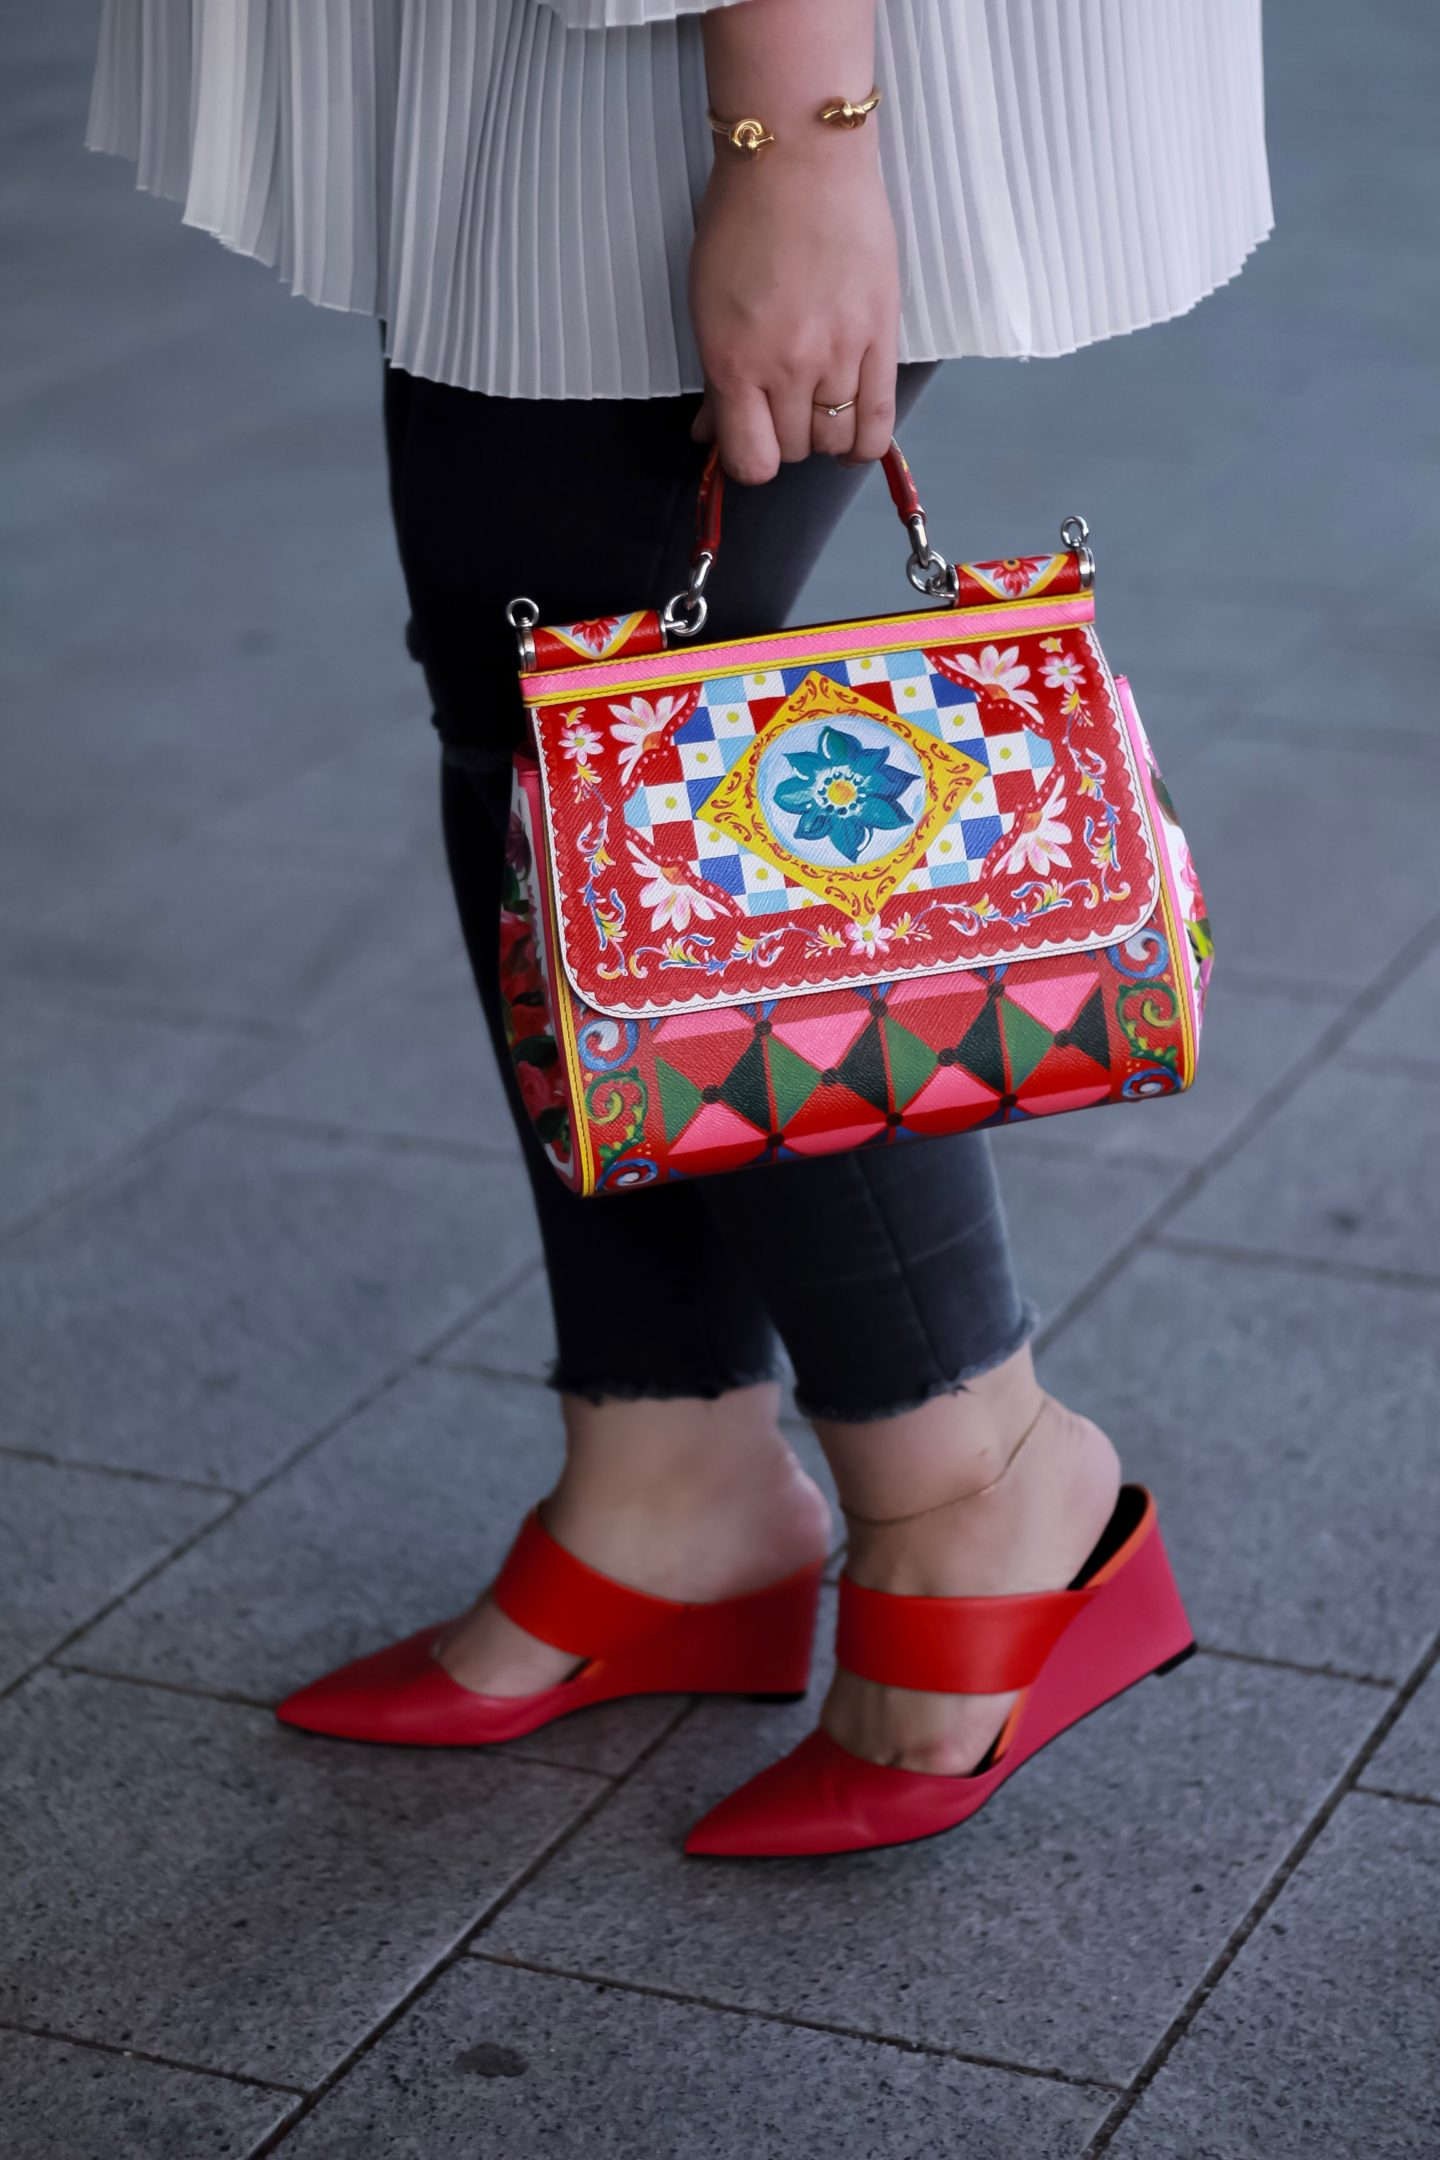 Dolce-Gabbana-Sicily-Mambo-Bag-Carretto-Print-Miss-Suzie-Loves-Susanne-Heidebach